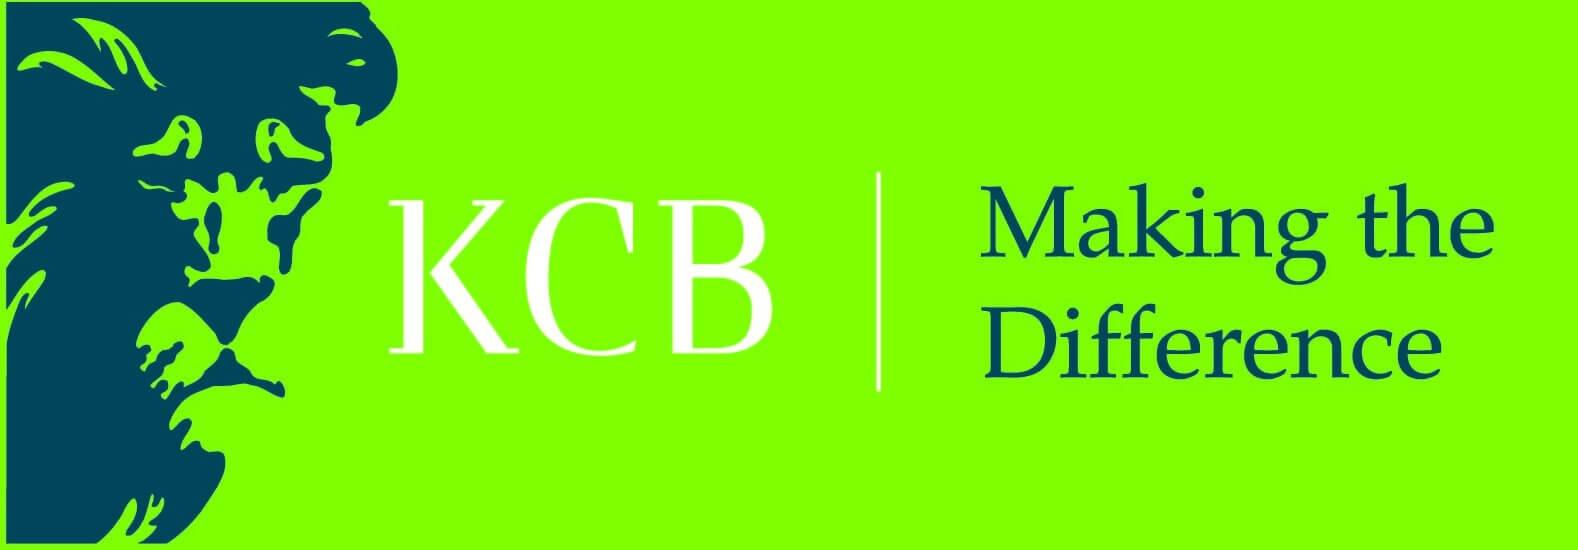 KCB Tuskys MasterCard